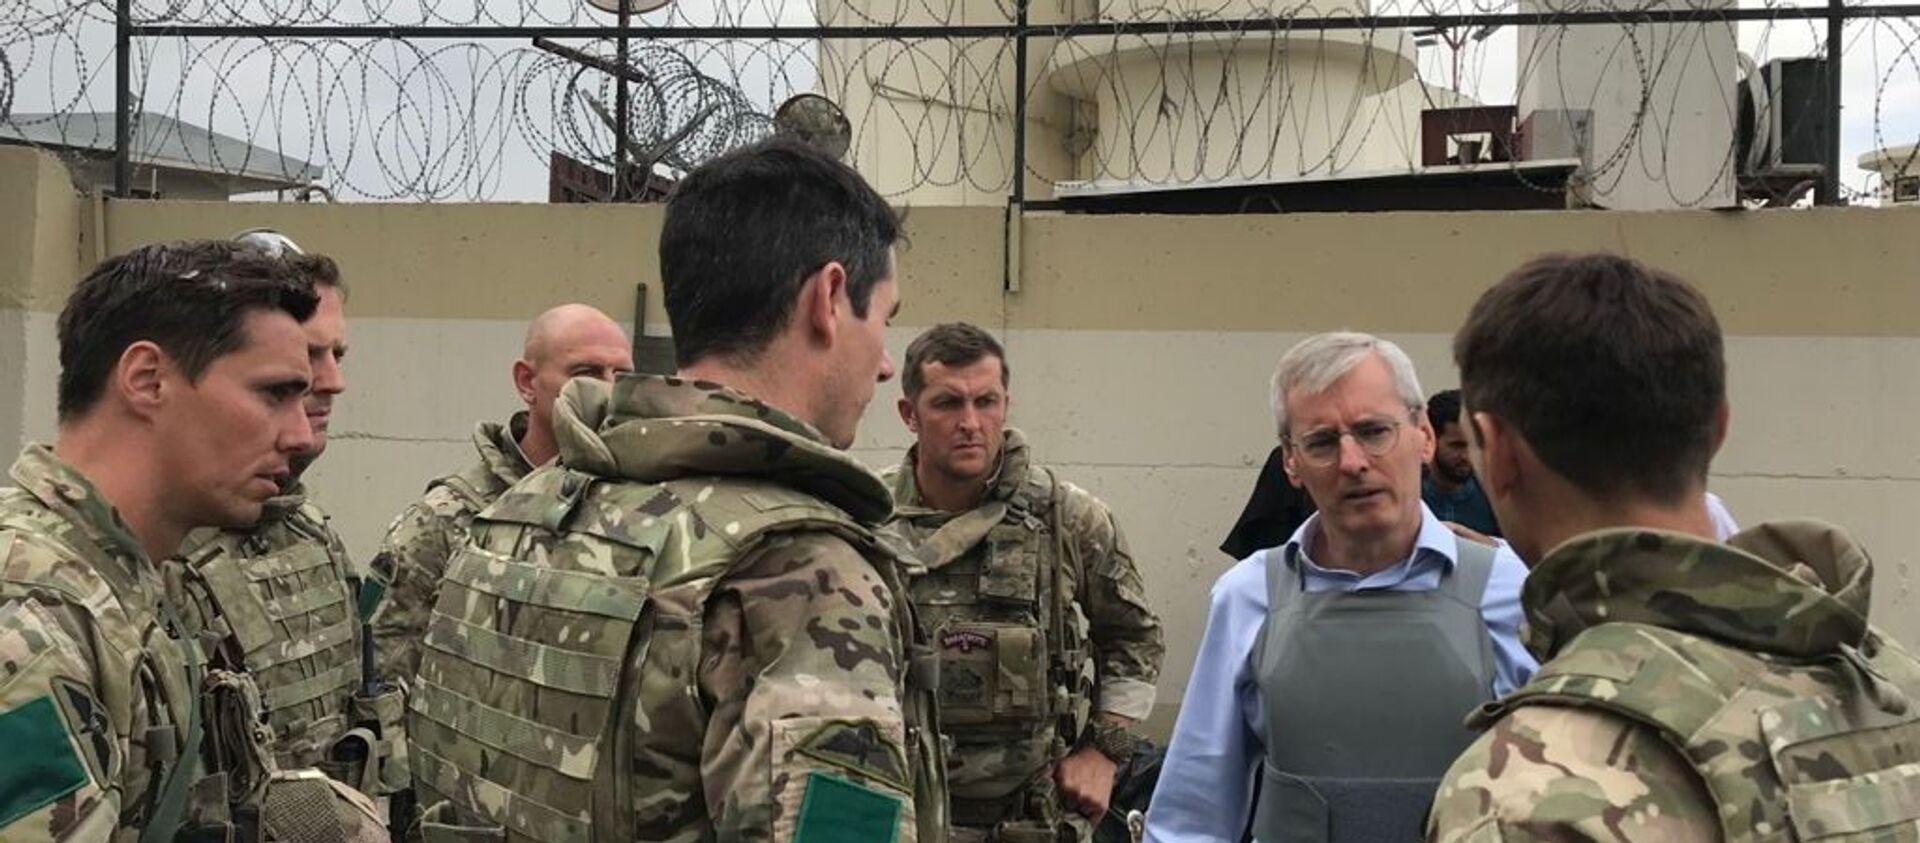 HMG staff facilitate UK evacuation effort in Kabul - Sputnik International, 1920, 22.08.2021